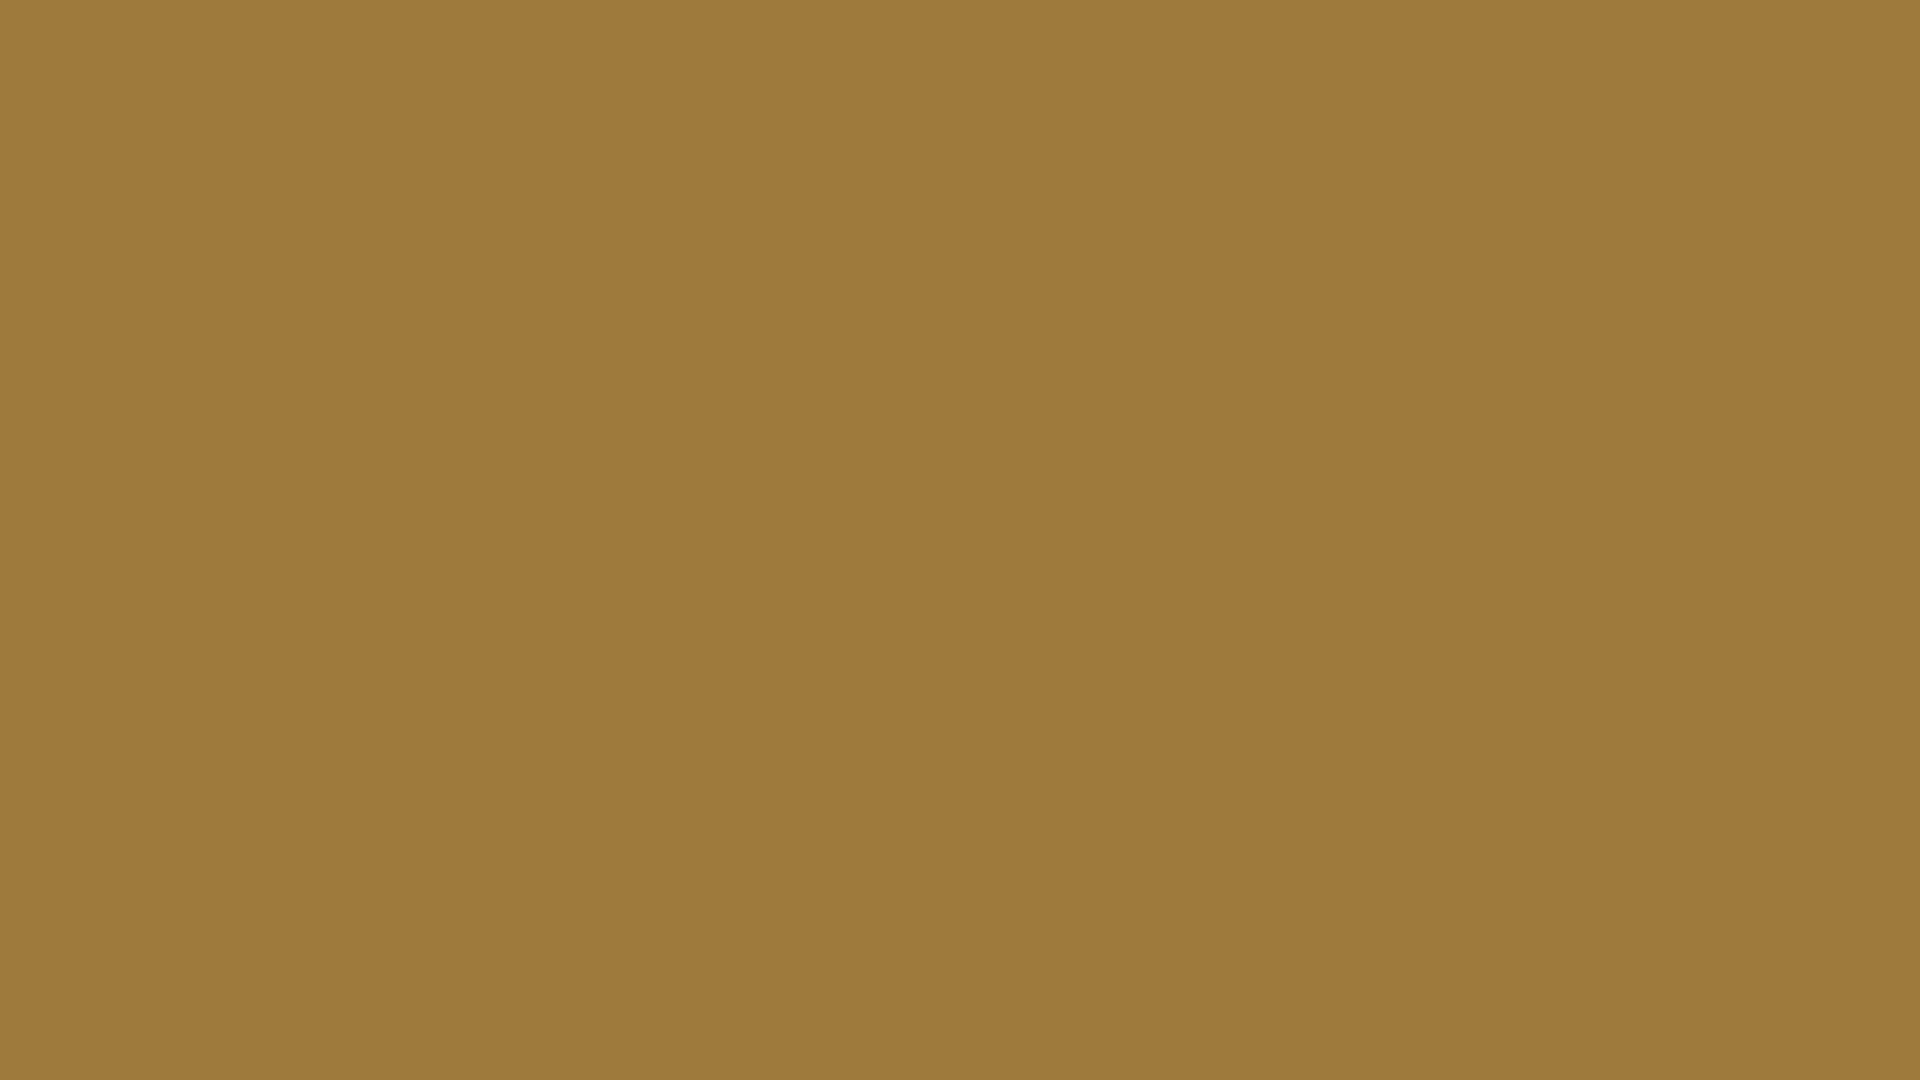 1920x1080 Metallic Sunburst Solid Color Background